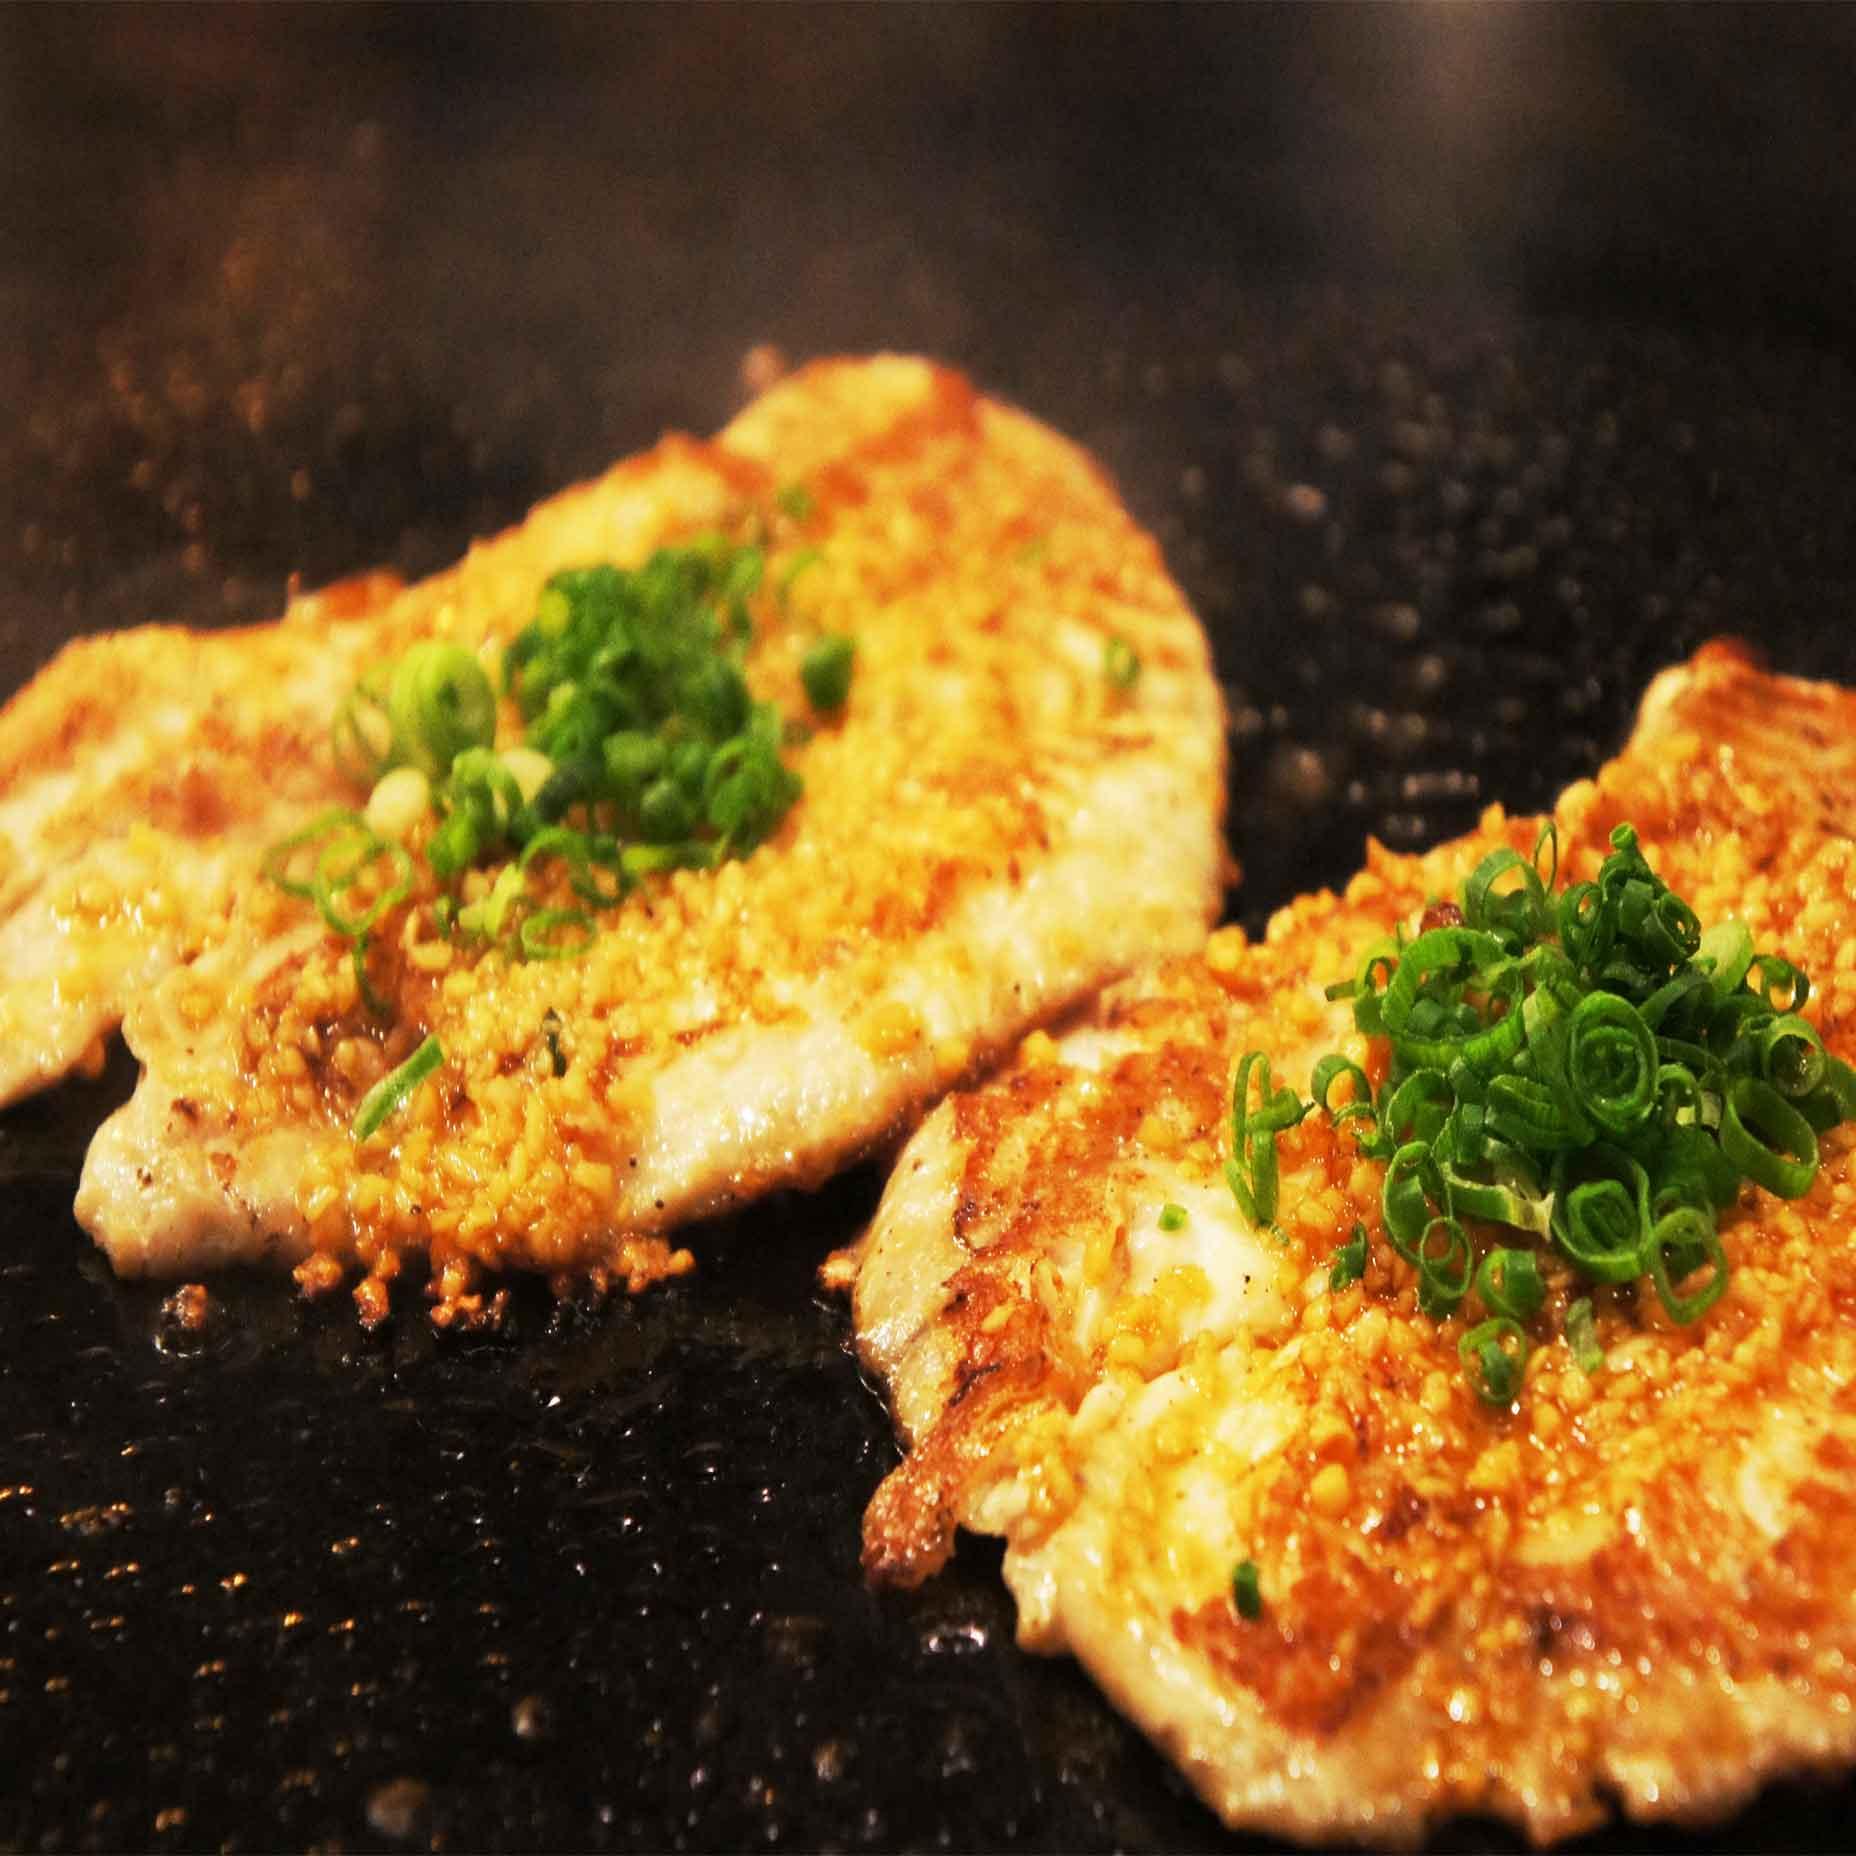 Wok Of Fame - All you can eat buffet in Brampton - Teppanyaki Station